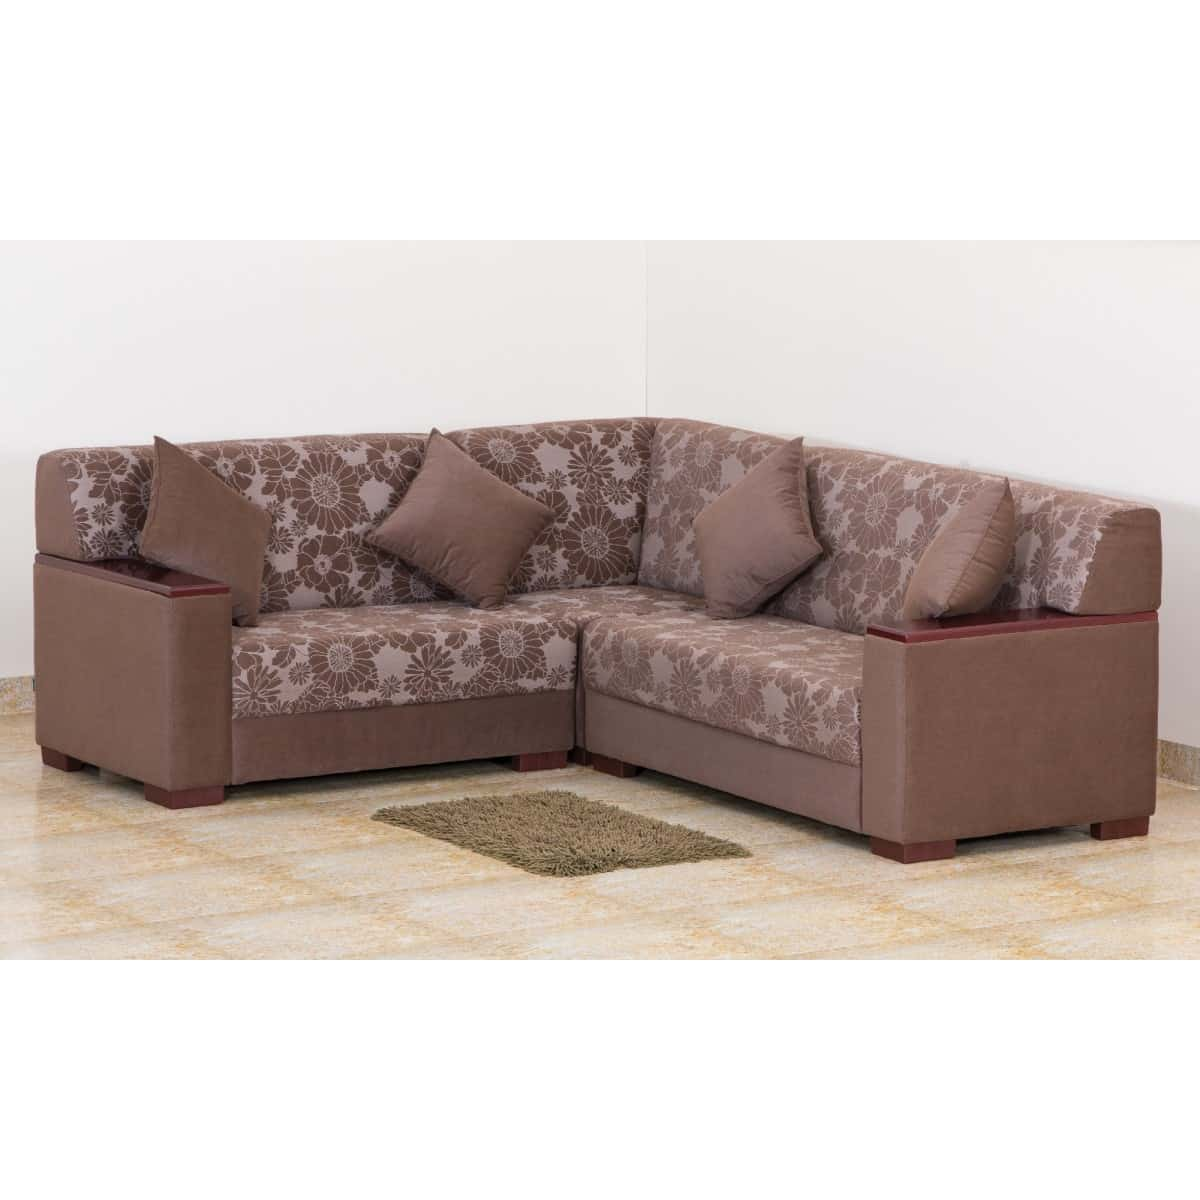 Sofa L Free Shipping Clic American Design Genuine Leather